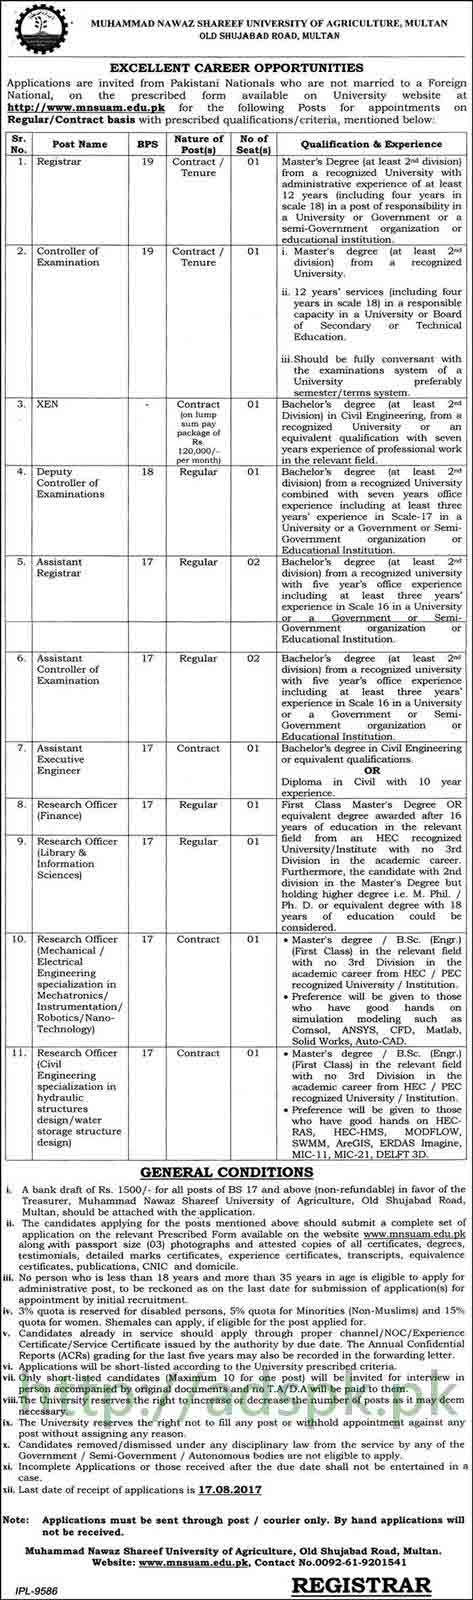 Jobs Muhammad Nawaz Shareef University of Agriculture Multan Jobs 2017 Registrar Controller Examination XEN Assistant Registrar Research Officers Jobs Application Form Deadline 17-08-2017 Apply Now